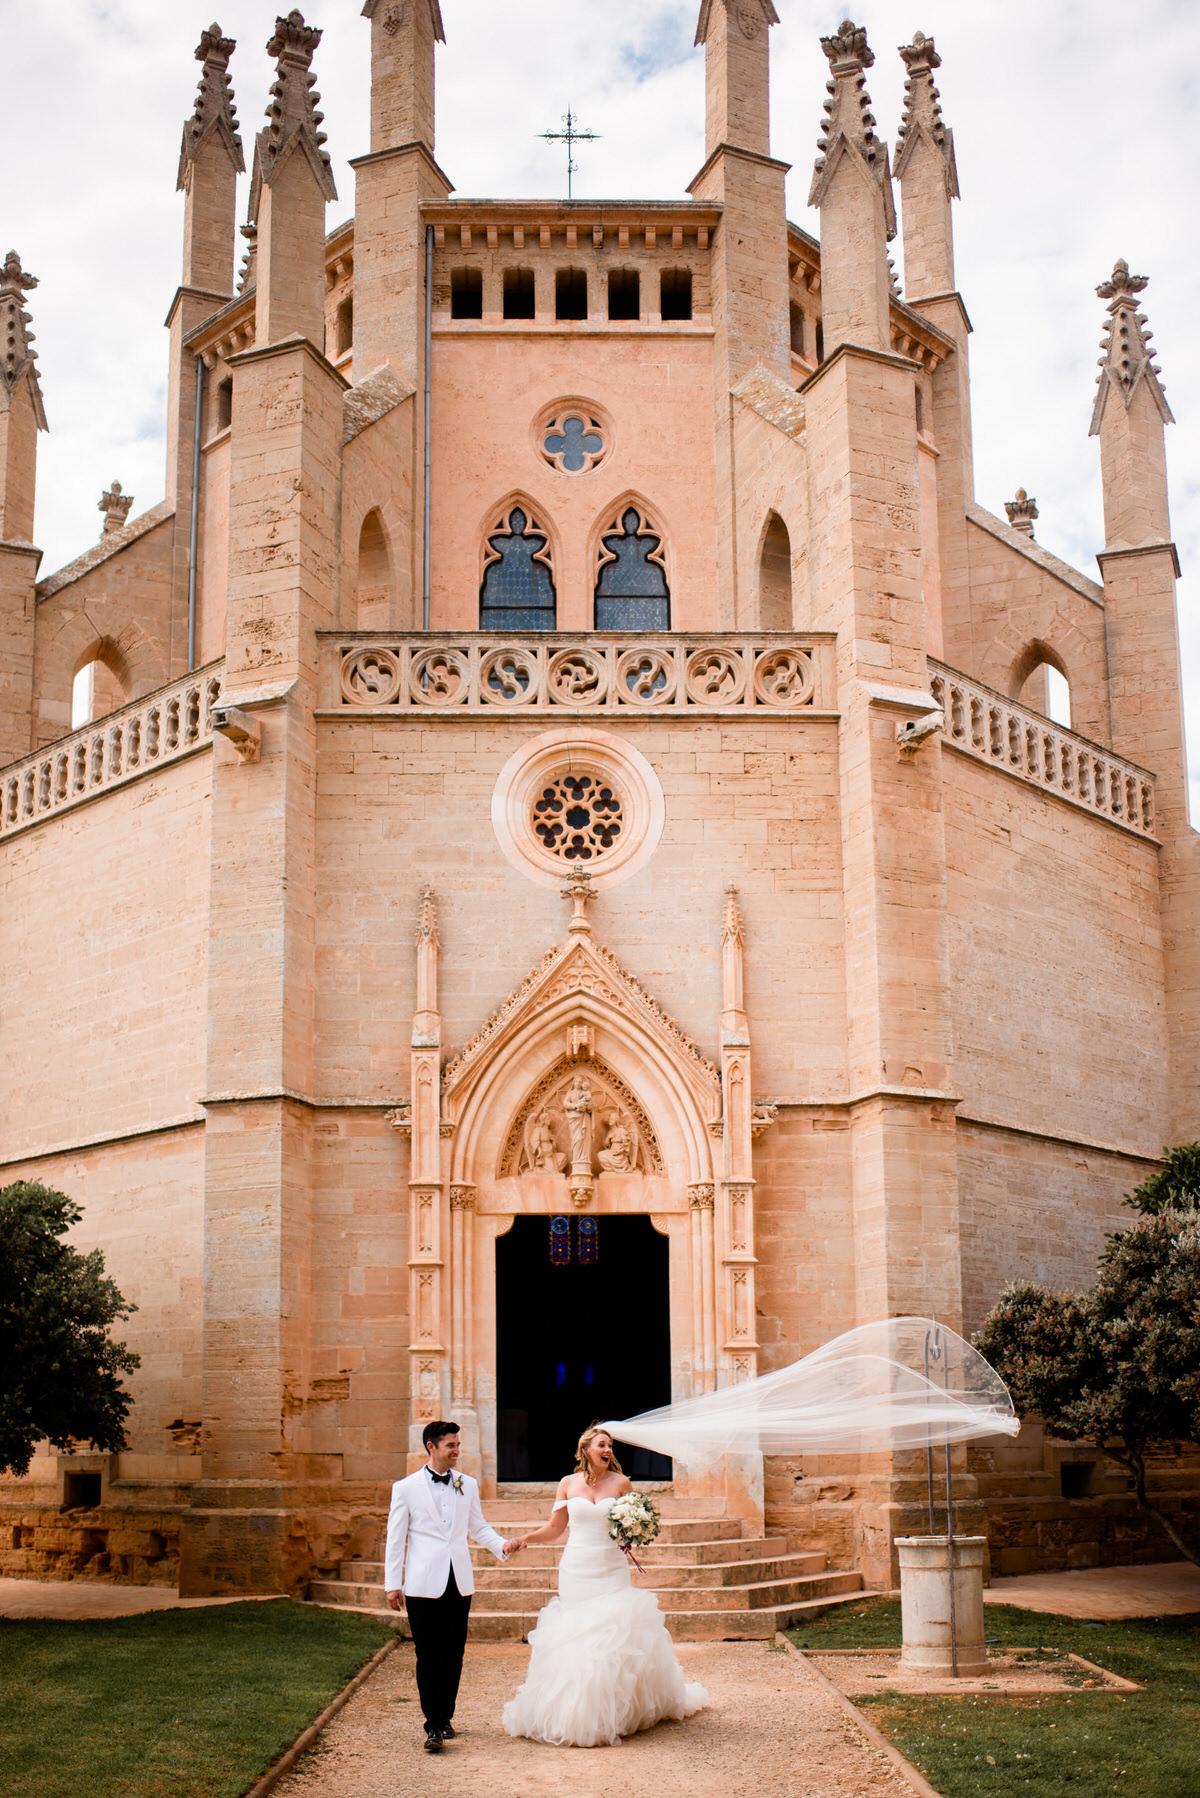 Bride and groom on the church steps - Roger Castellvi